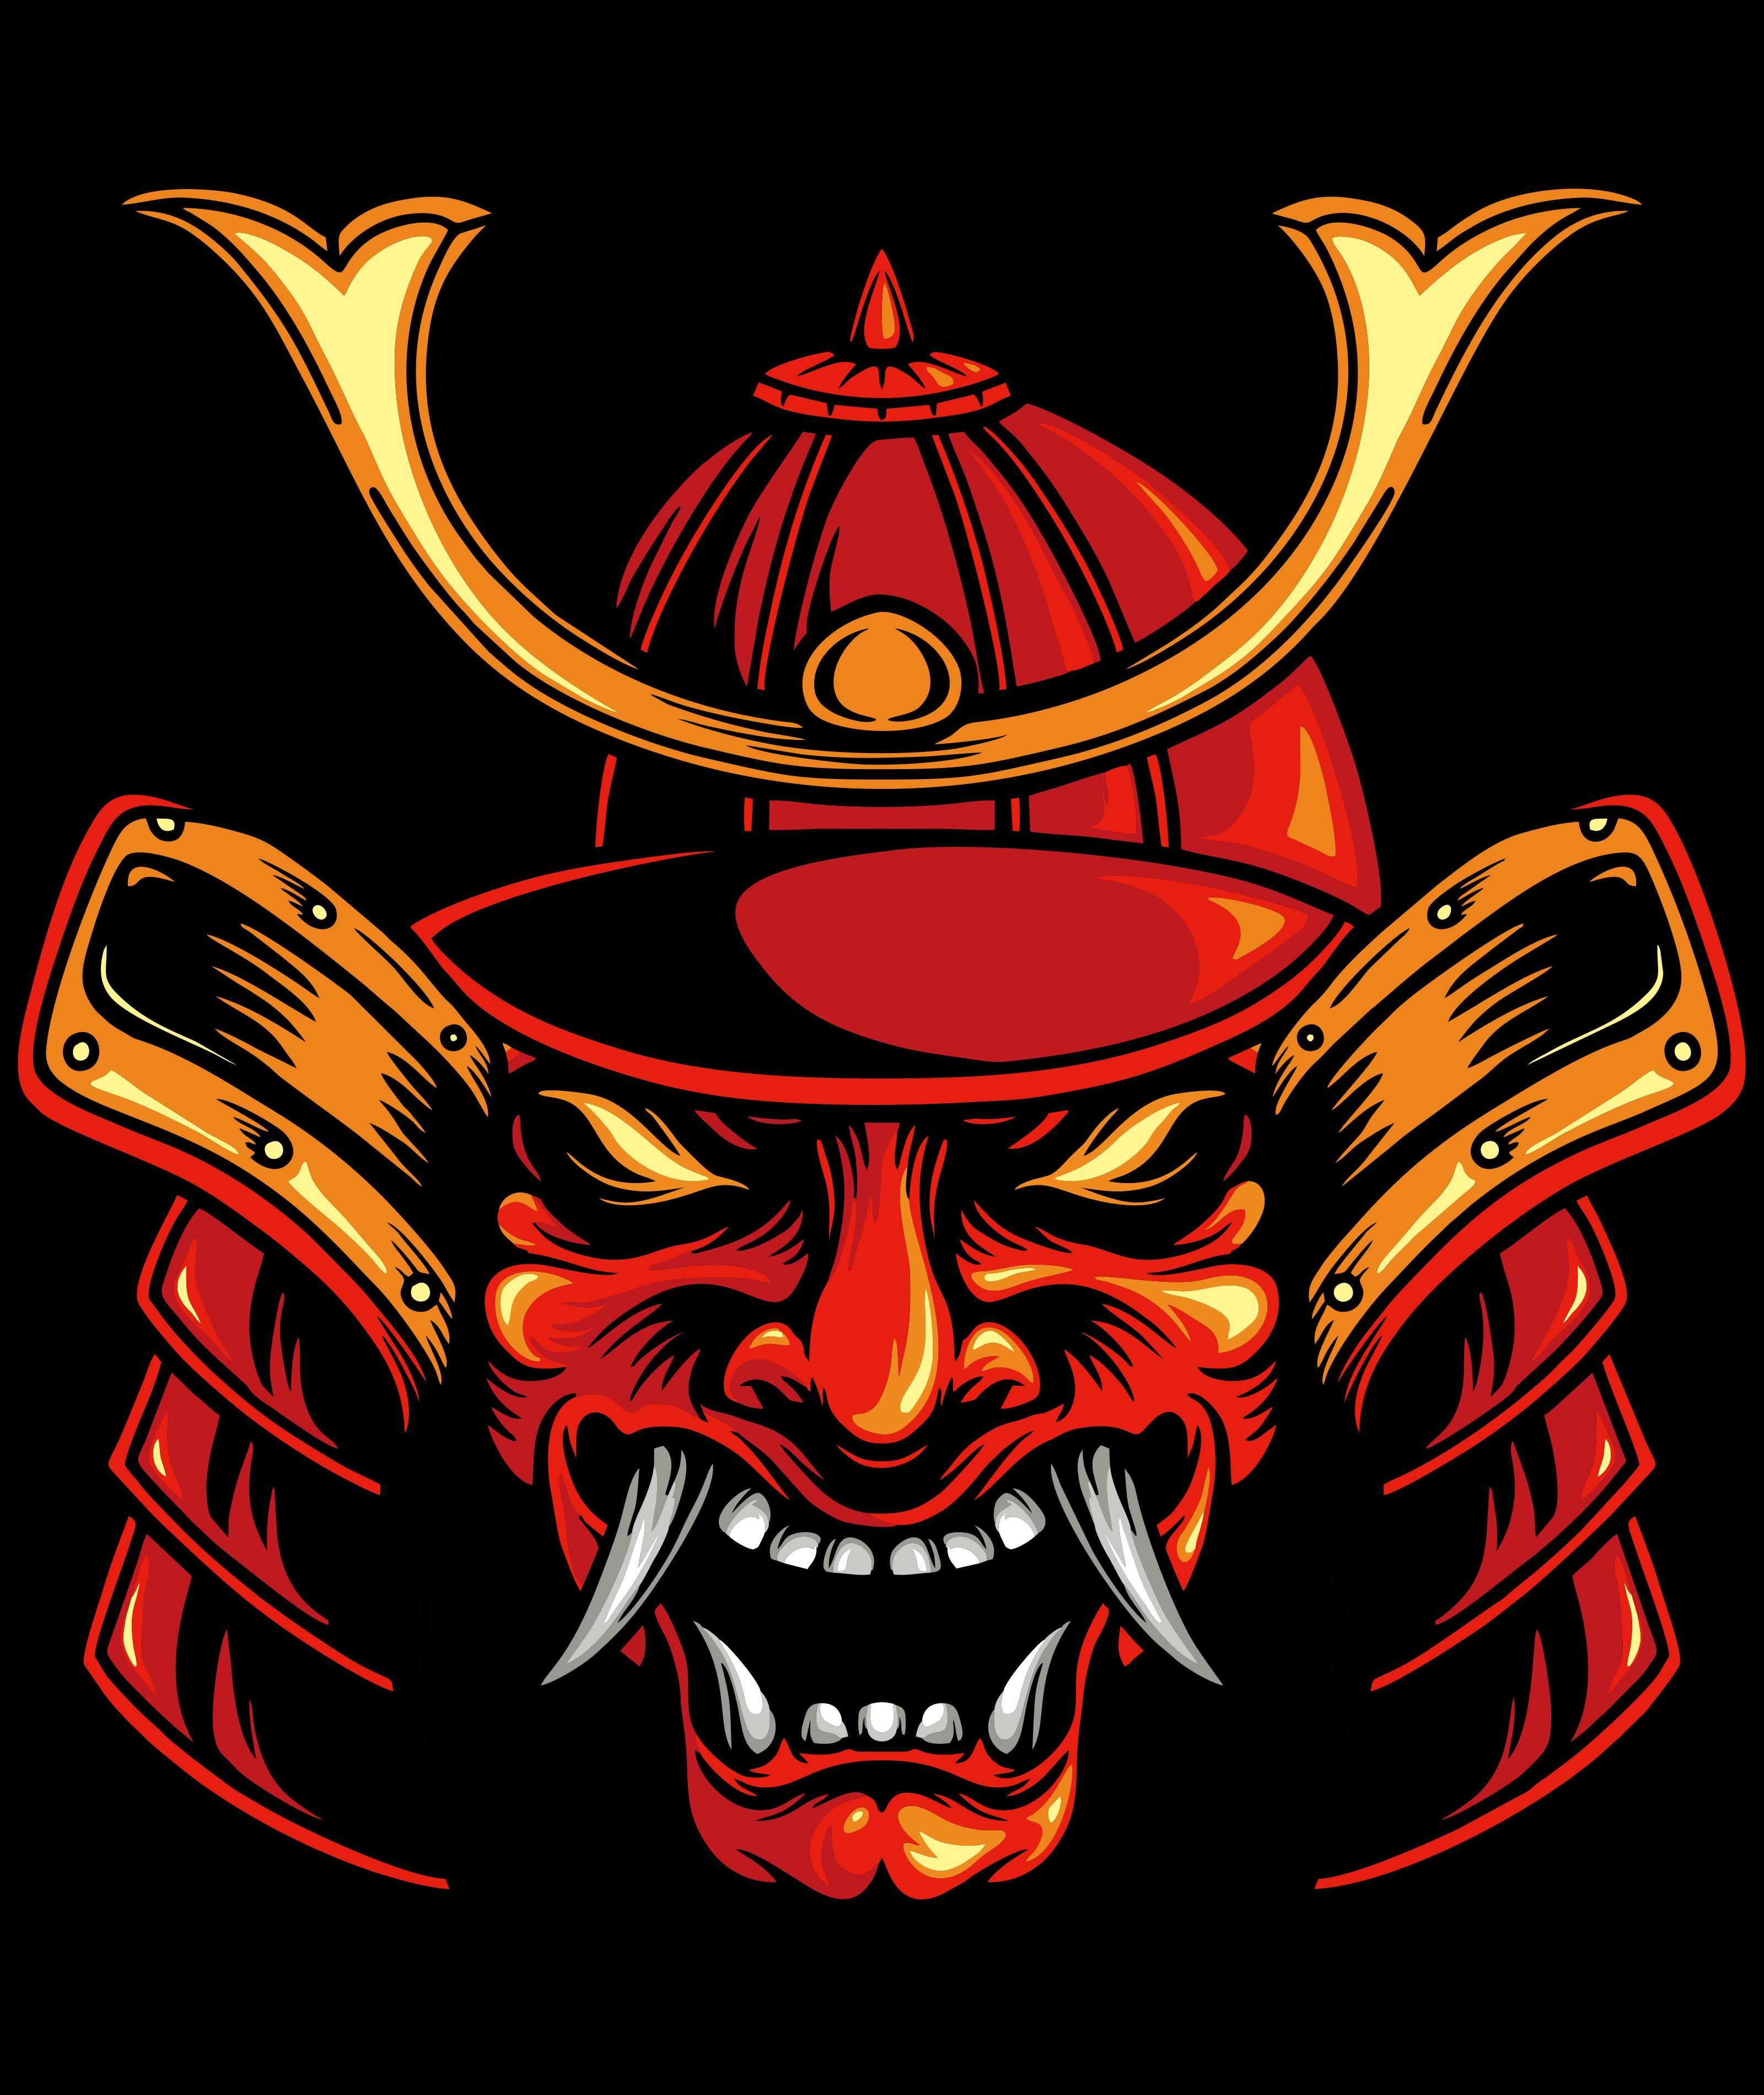 Traditional Mask Head Samurai Japan Samurai Samurai Helmet Samurai Armor